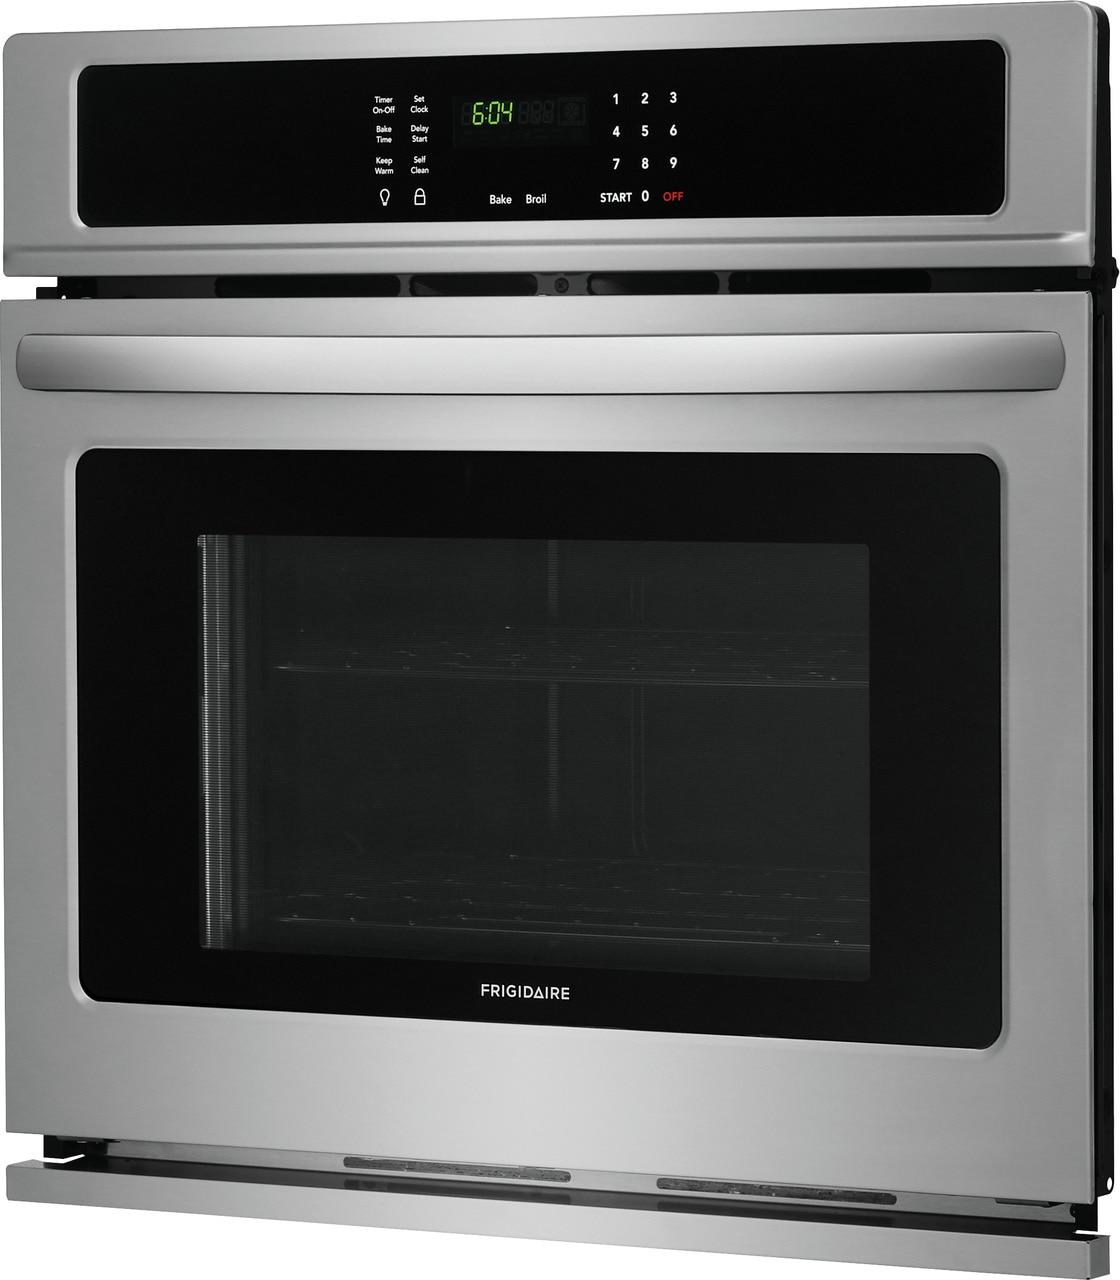 "Model: FFEW2726TS | Frigidaire 27"" Single Electric Wall Oven"